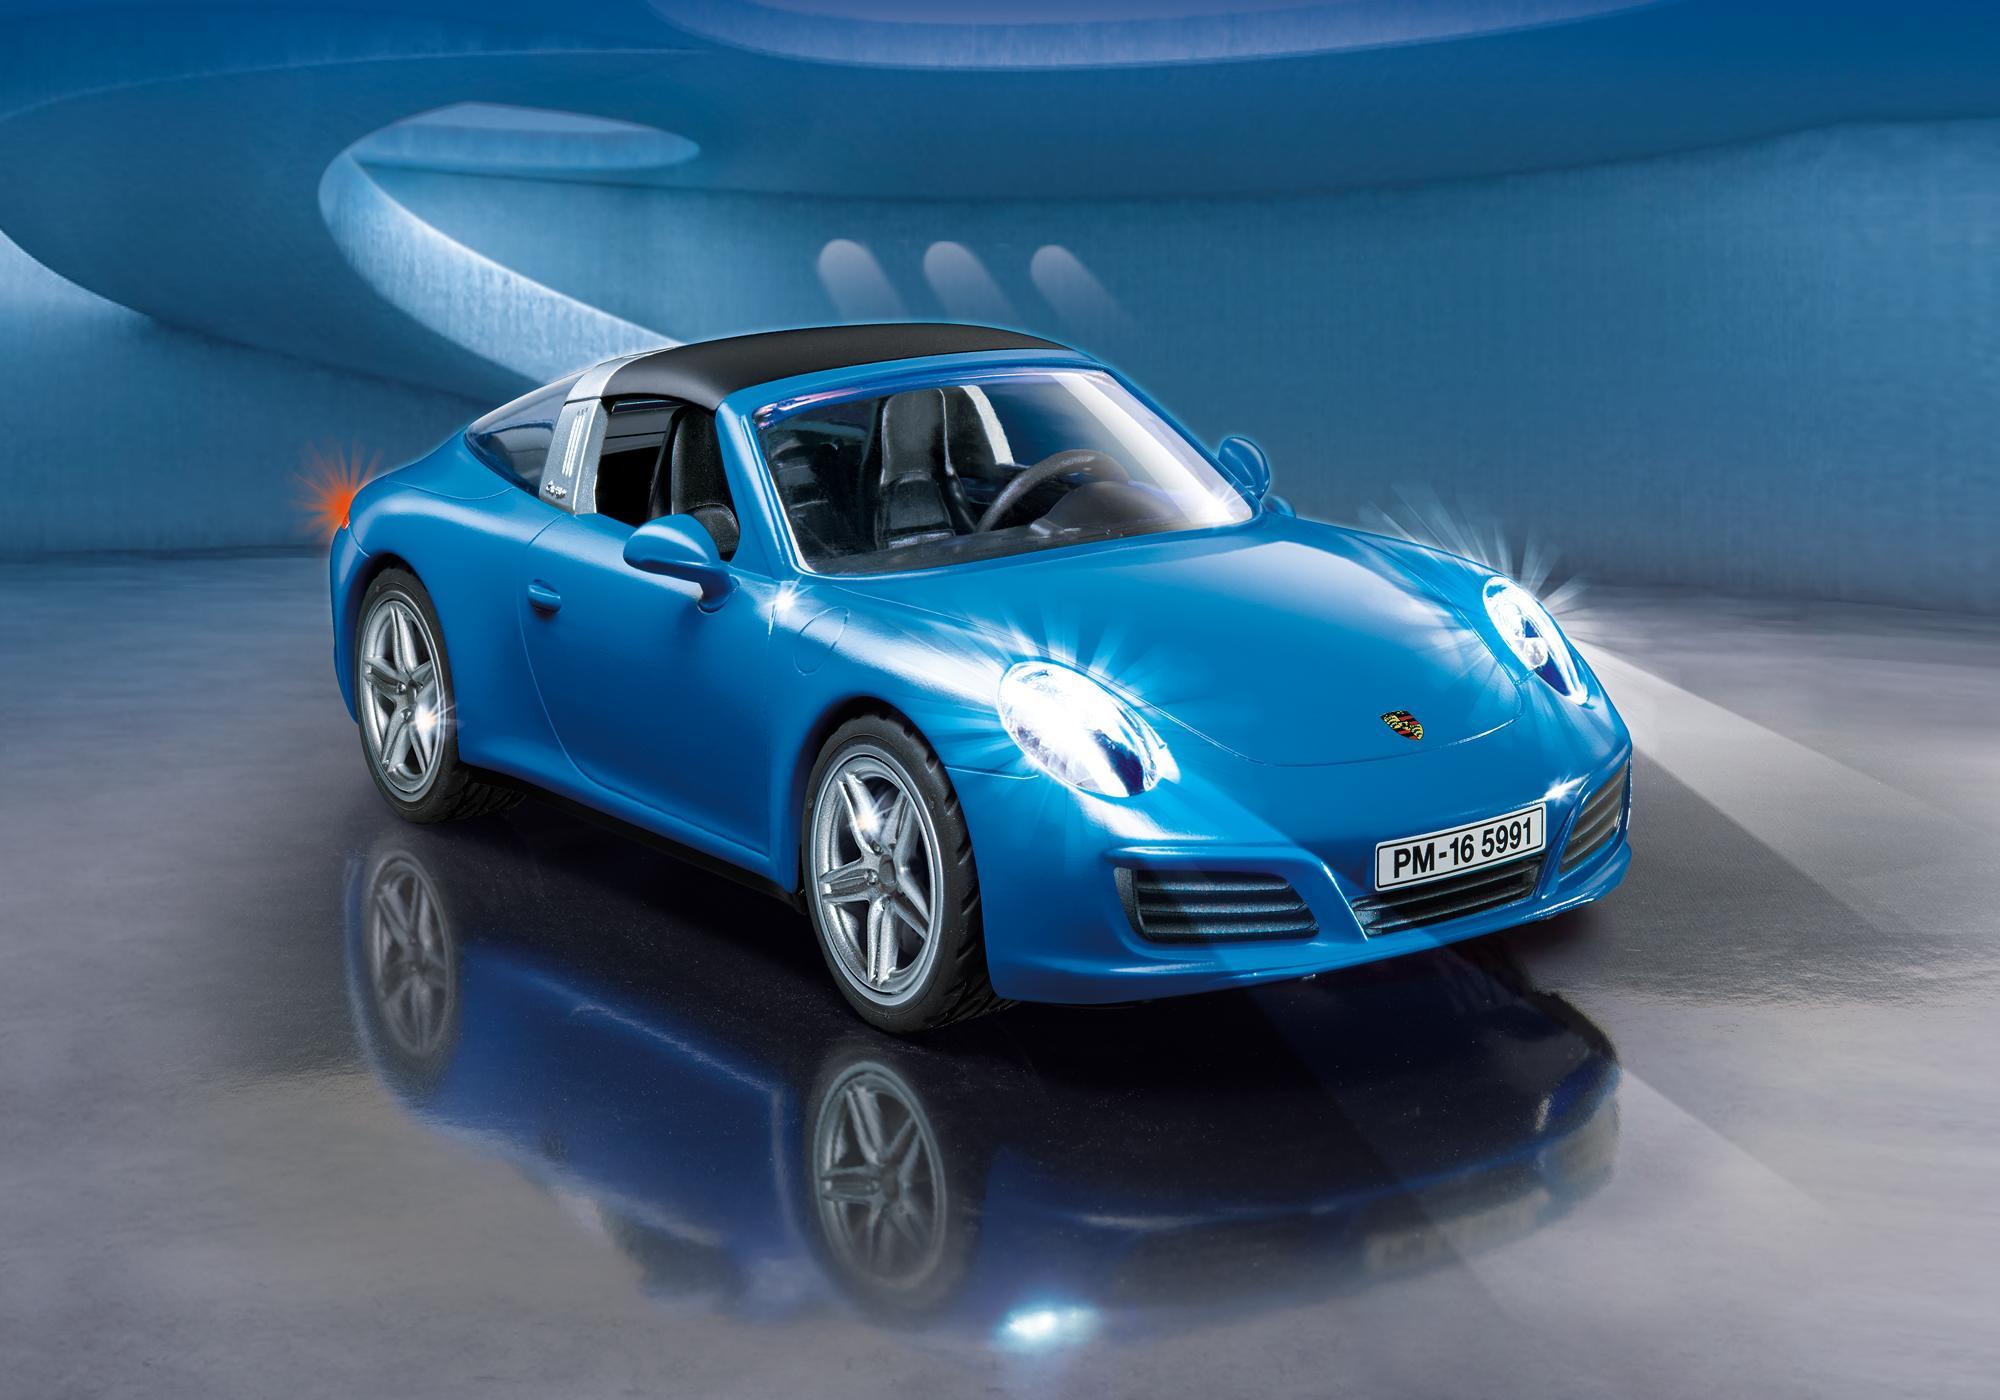 http://media.playmobil.com/i/playmobil/5991_product_extra2/Porsche 911 Targa 4S